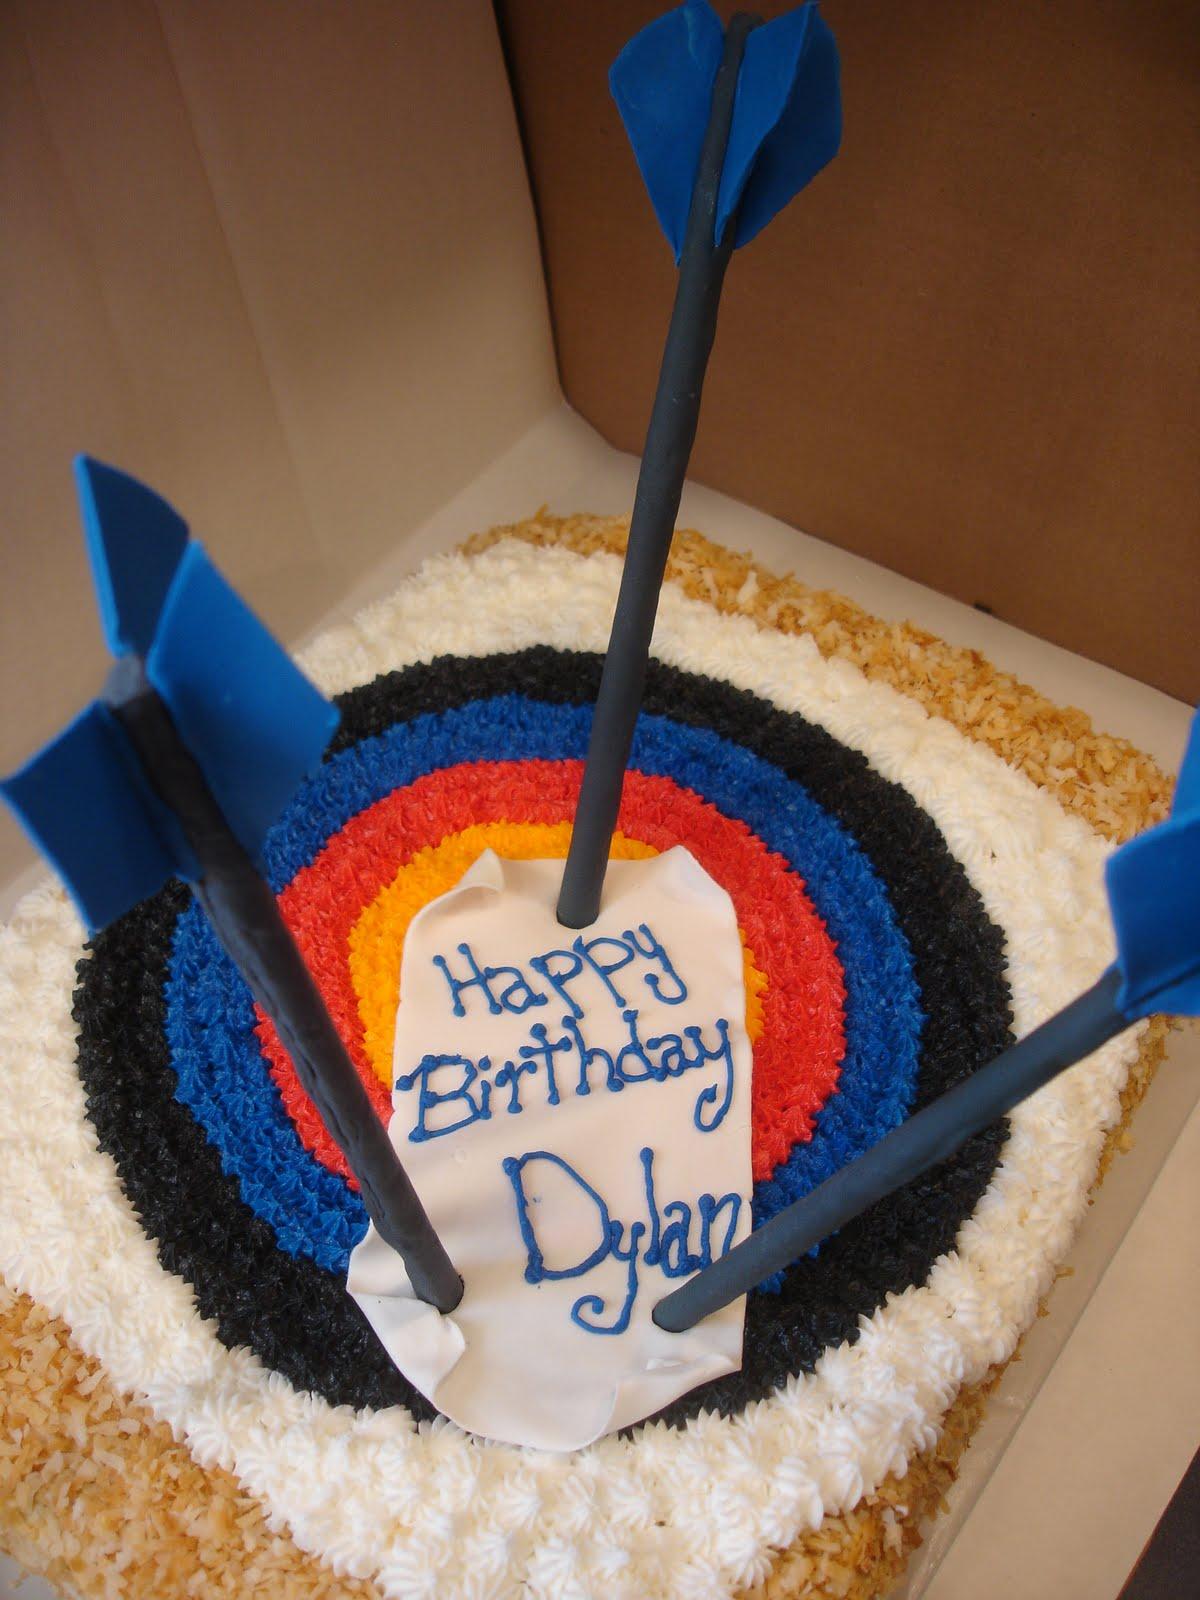 Deb S Cakery Happy Birthday Dylan